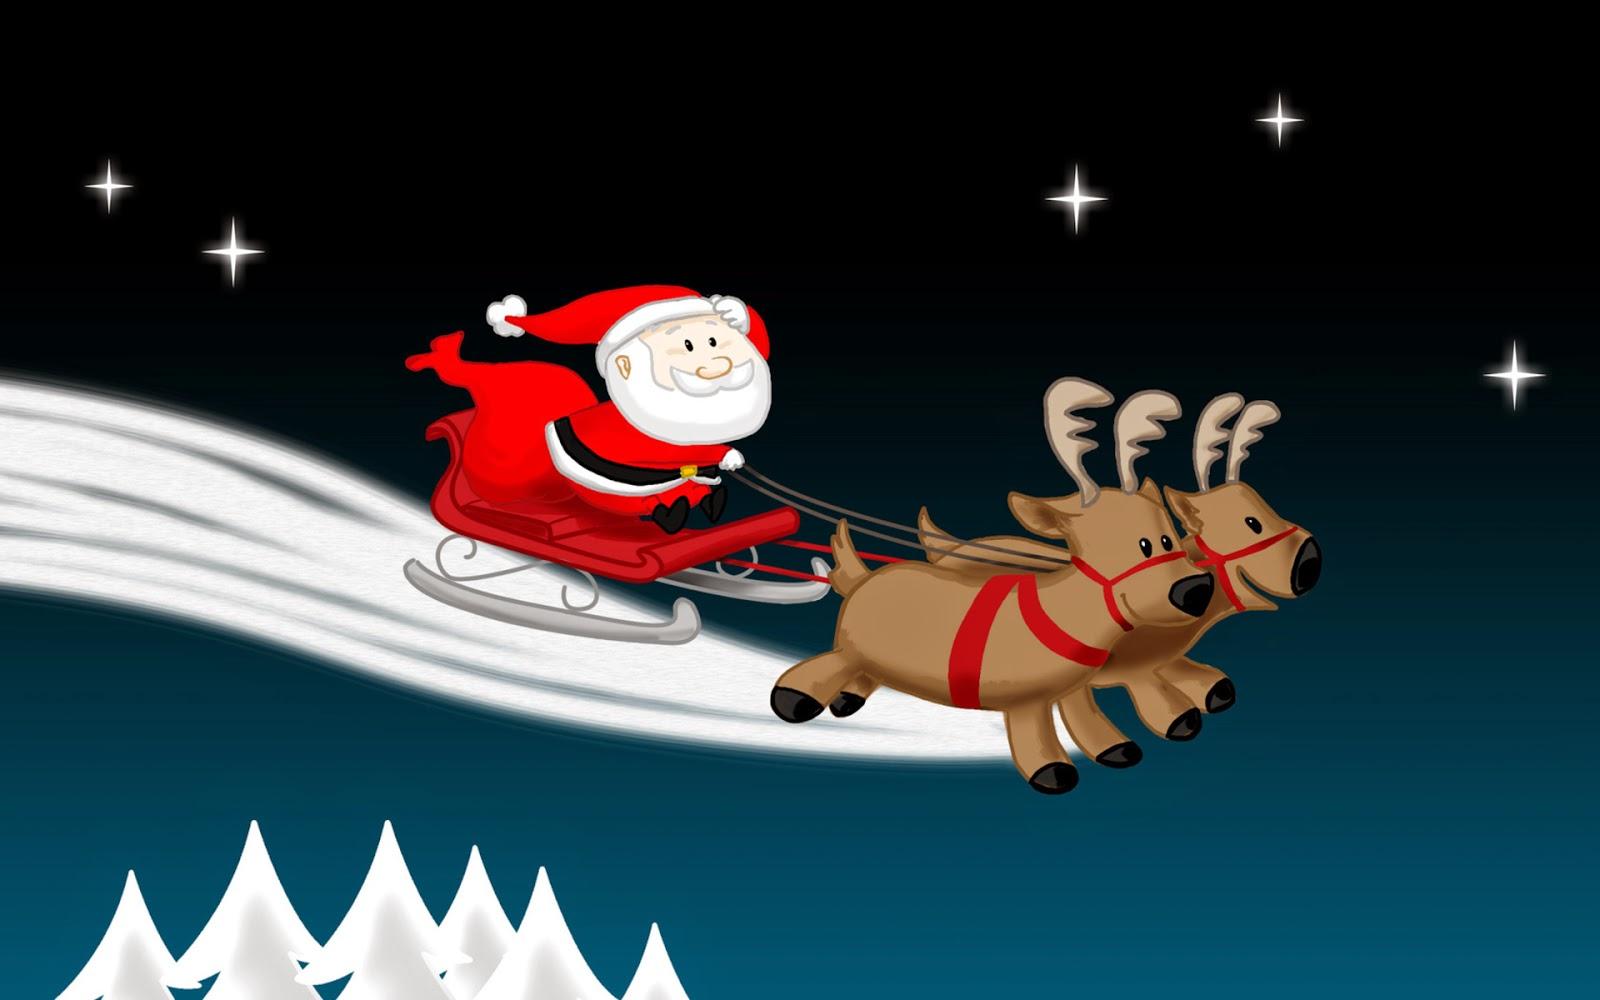 Santa-flying-in-sky-cartoon-image-for-kids.jpg